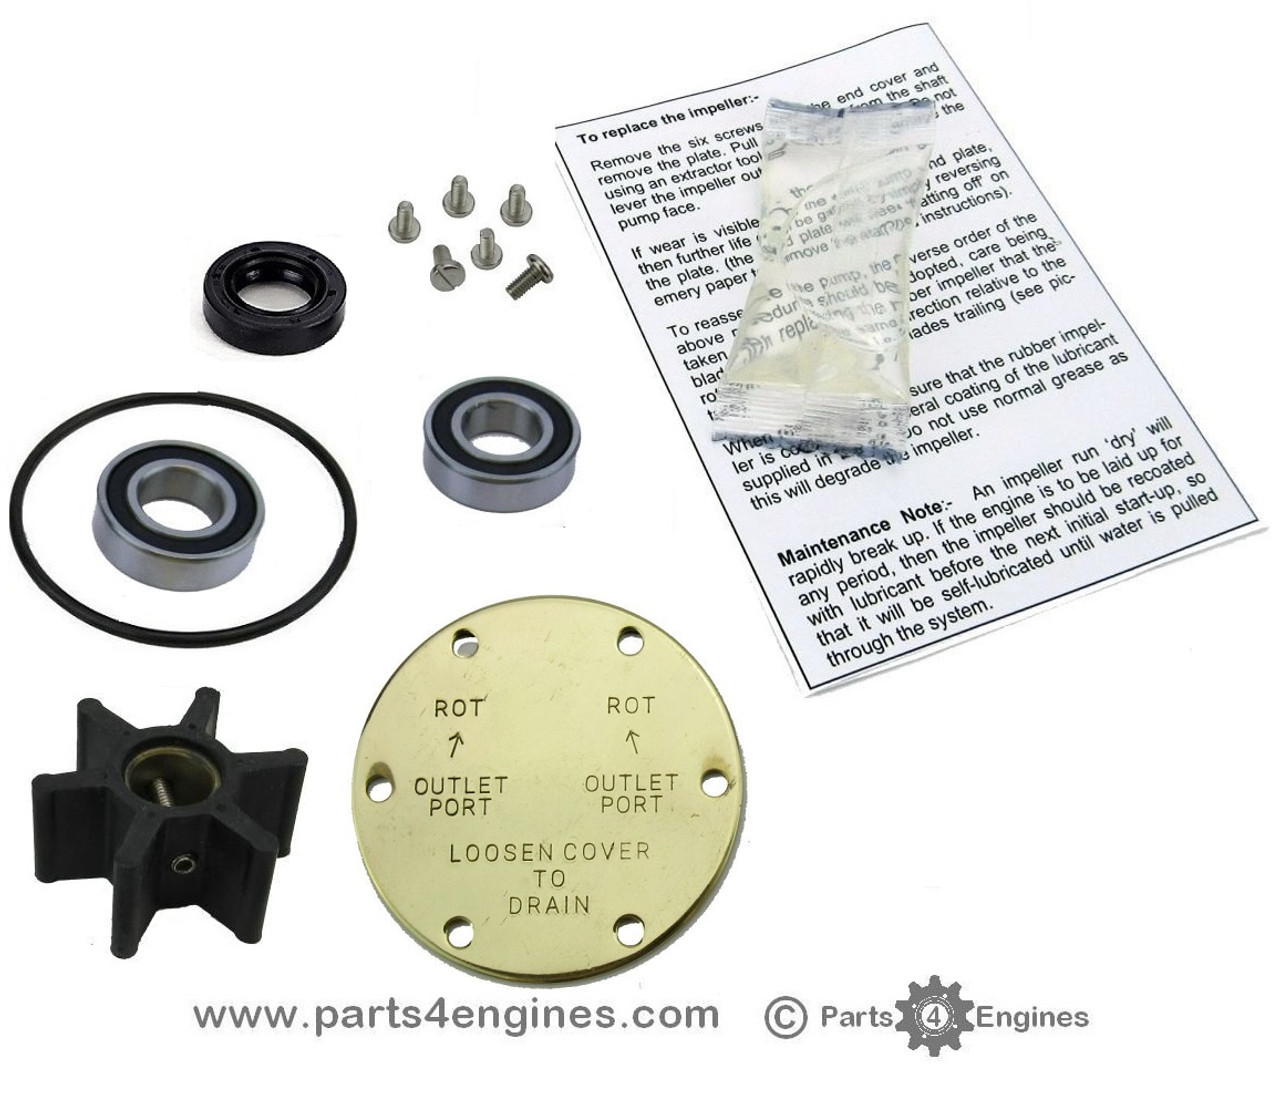 Yanmar 2GM20YEU & 3GM30YEU Raw water pump rebuild kit - parts4engines.com